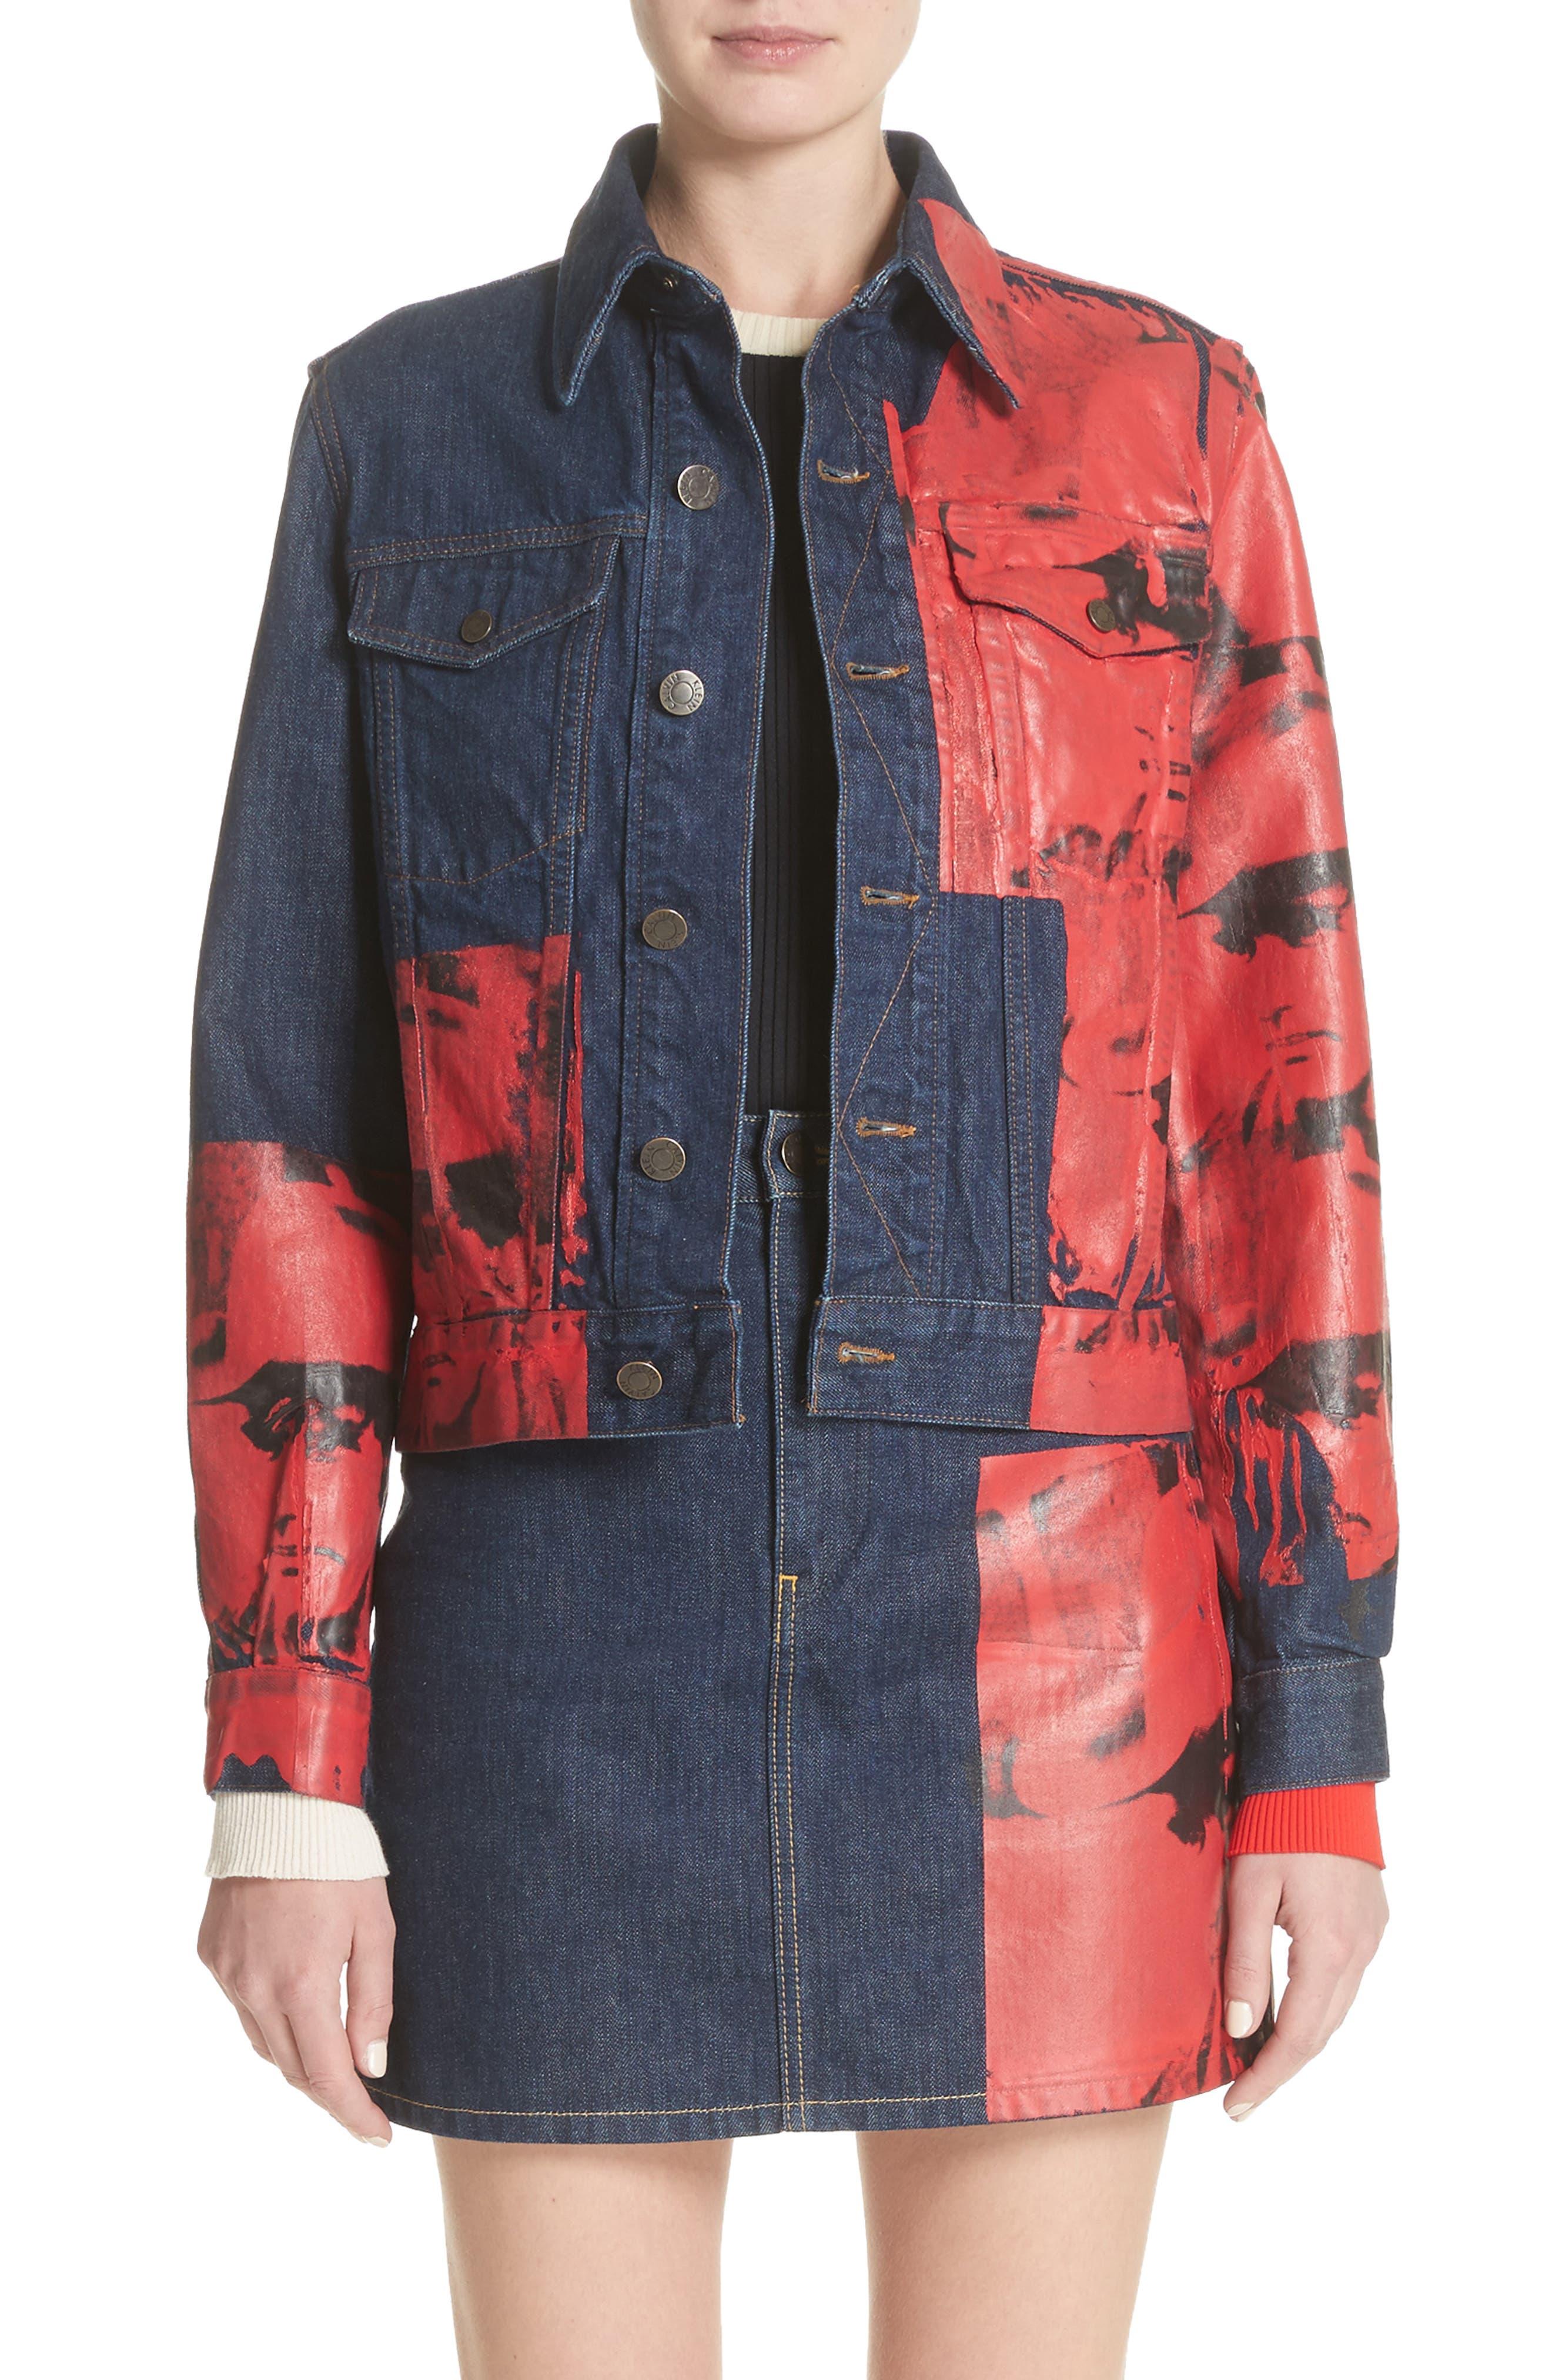 CALVIN KLEIN 205W39NYC x Andy Warhol Foundation Dennis Hopper Denim Jacket